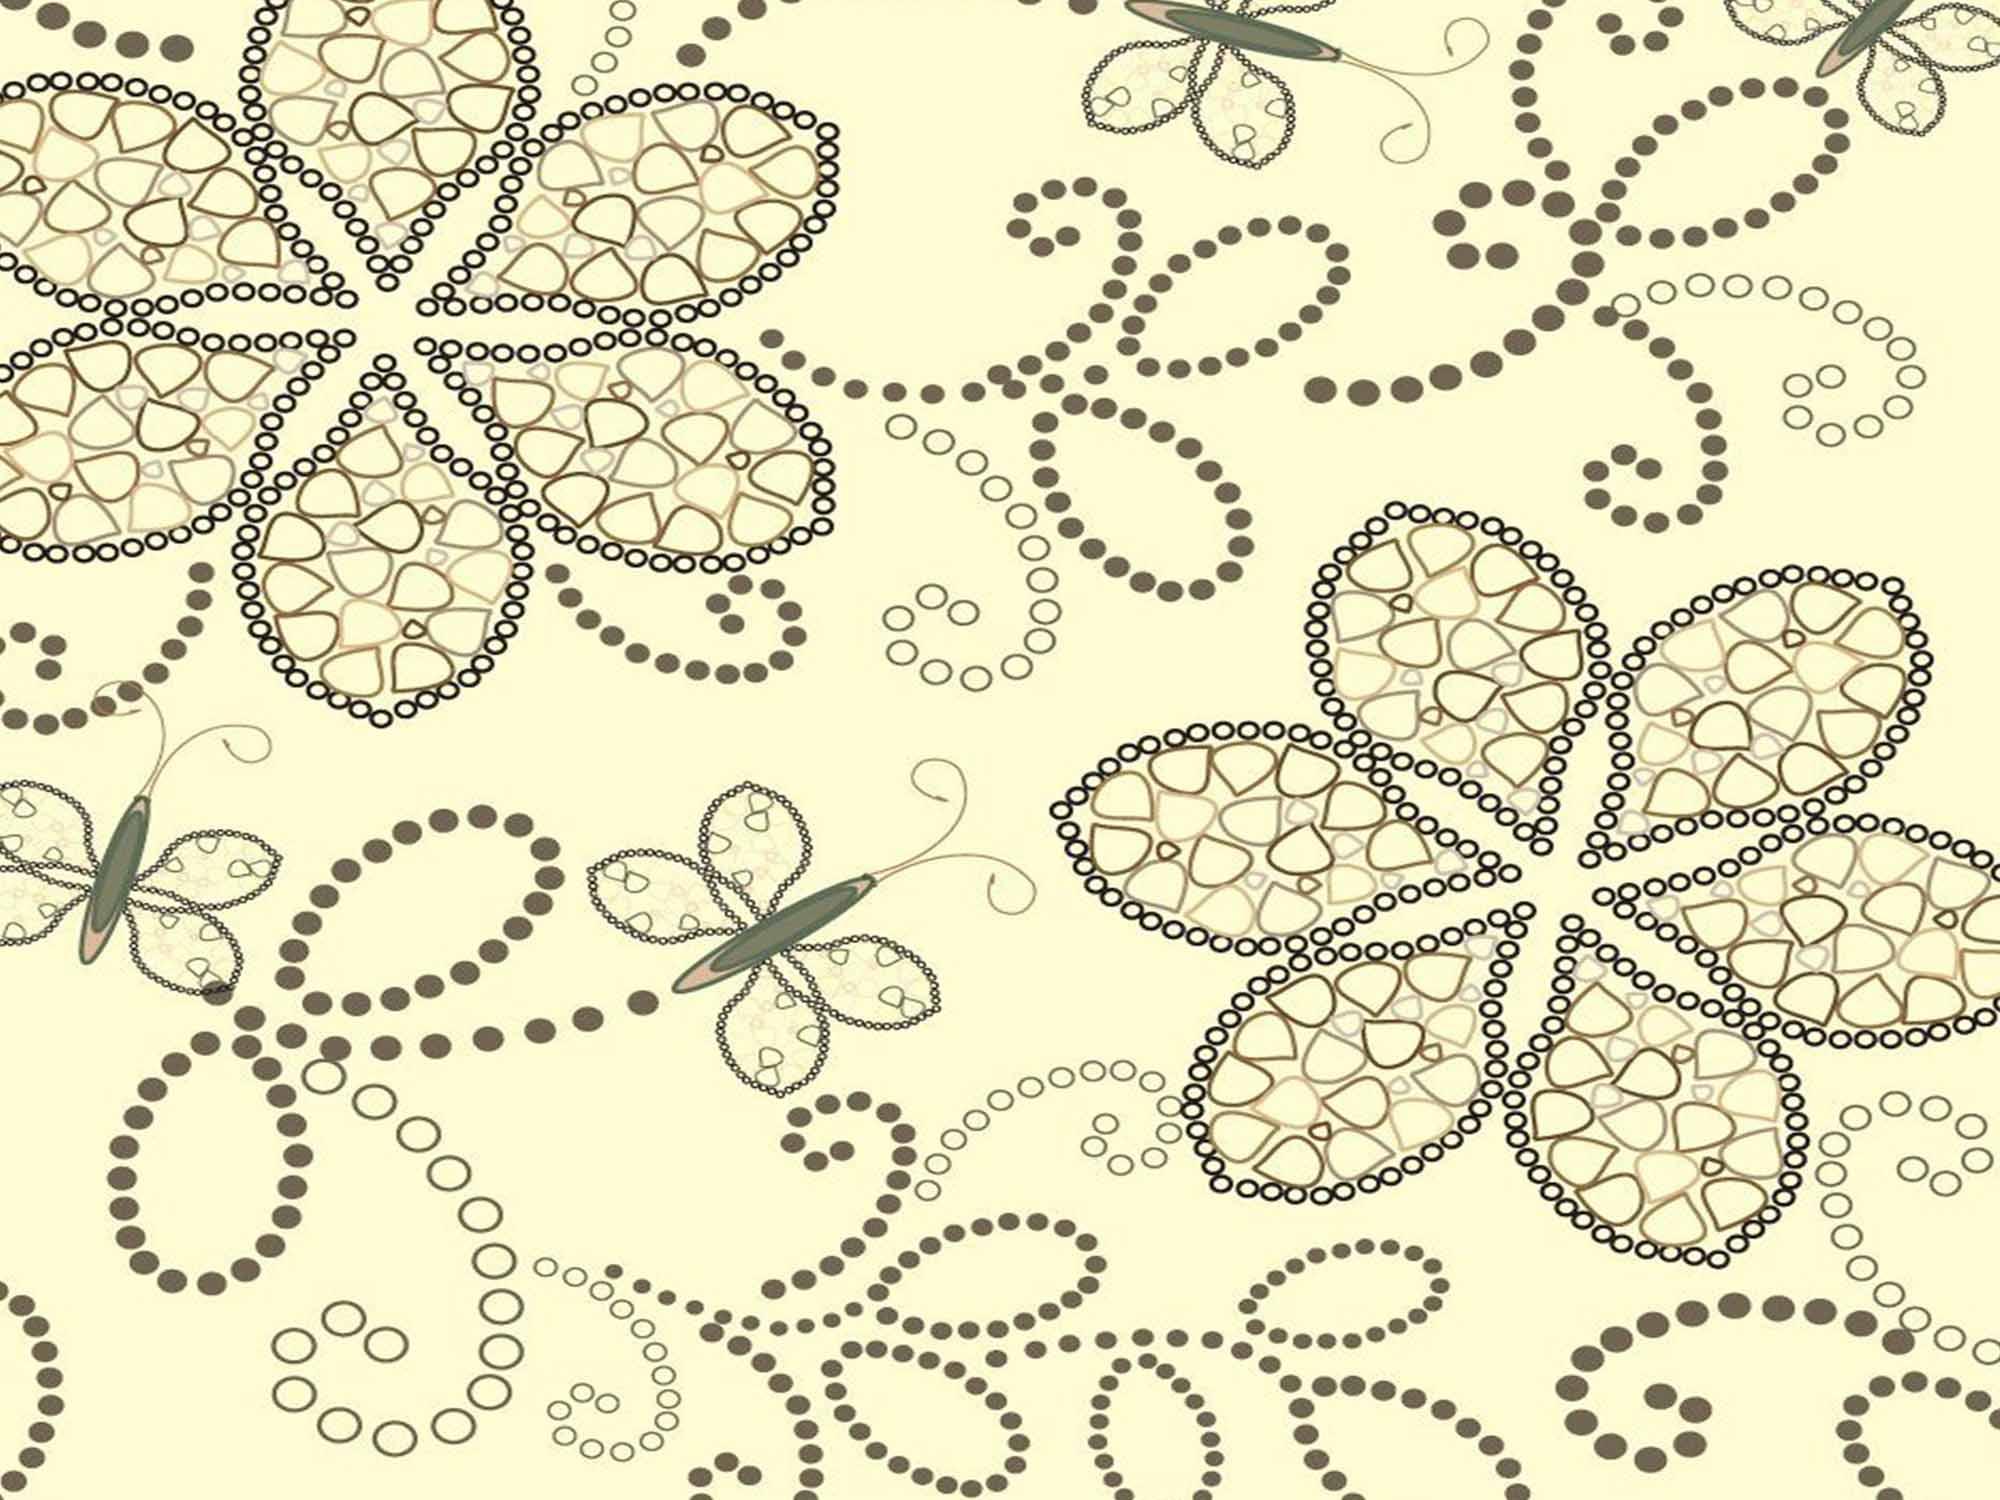 Papel de Parede Floral 0022 - Adesivos de Parede  - Paredes Decoradas